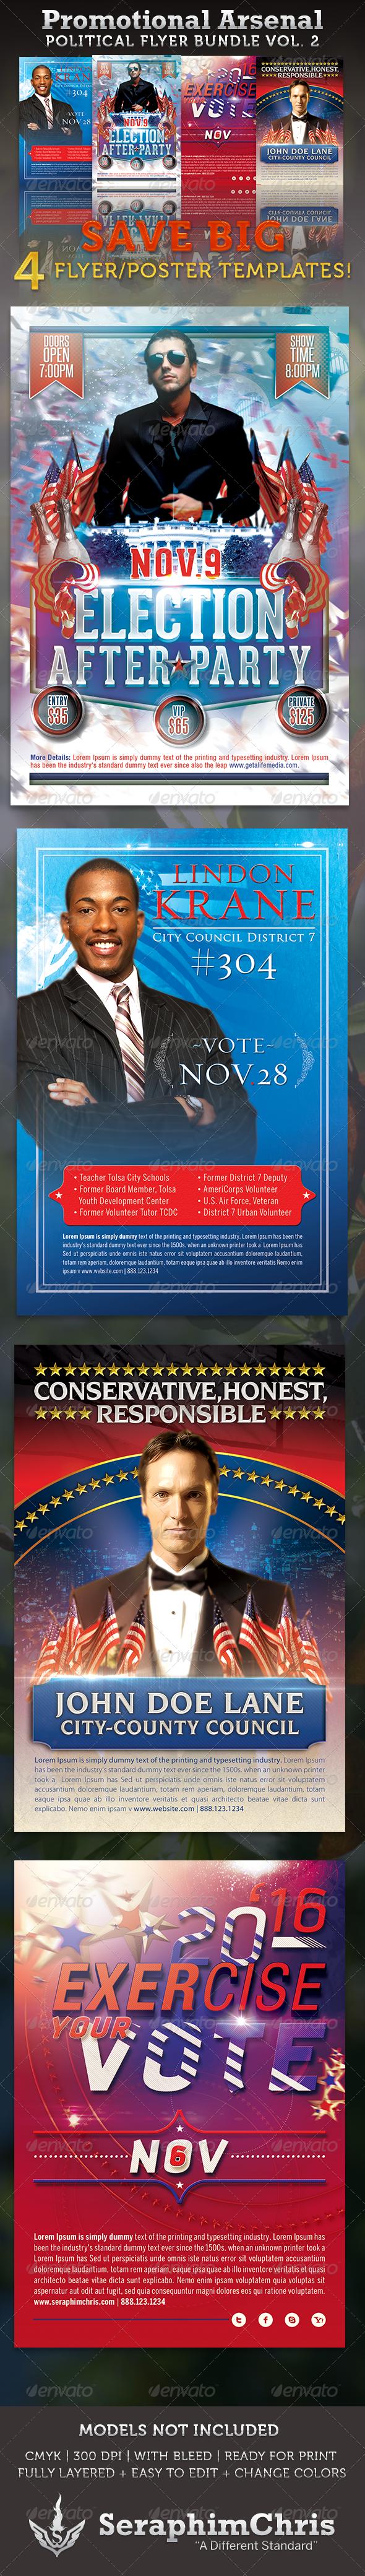 Promotional Arsenal Political Flyer Bundle 2 - Corporate Flyers